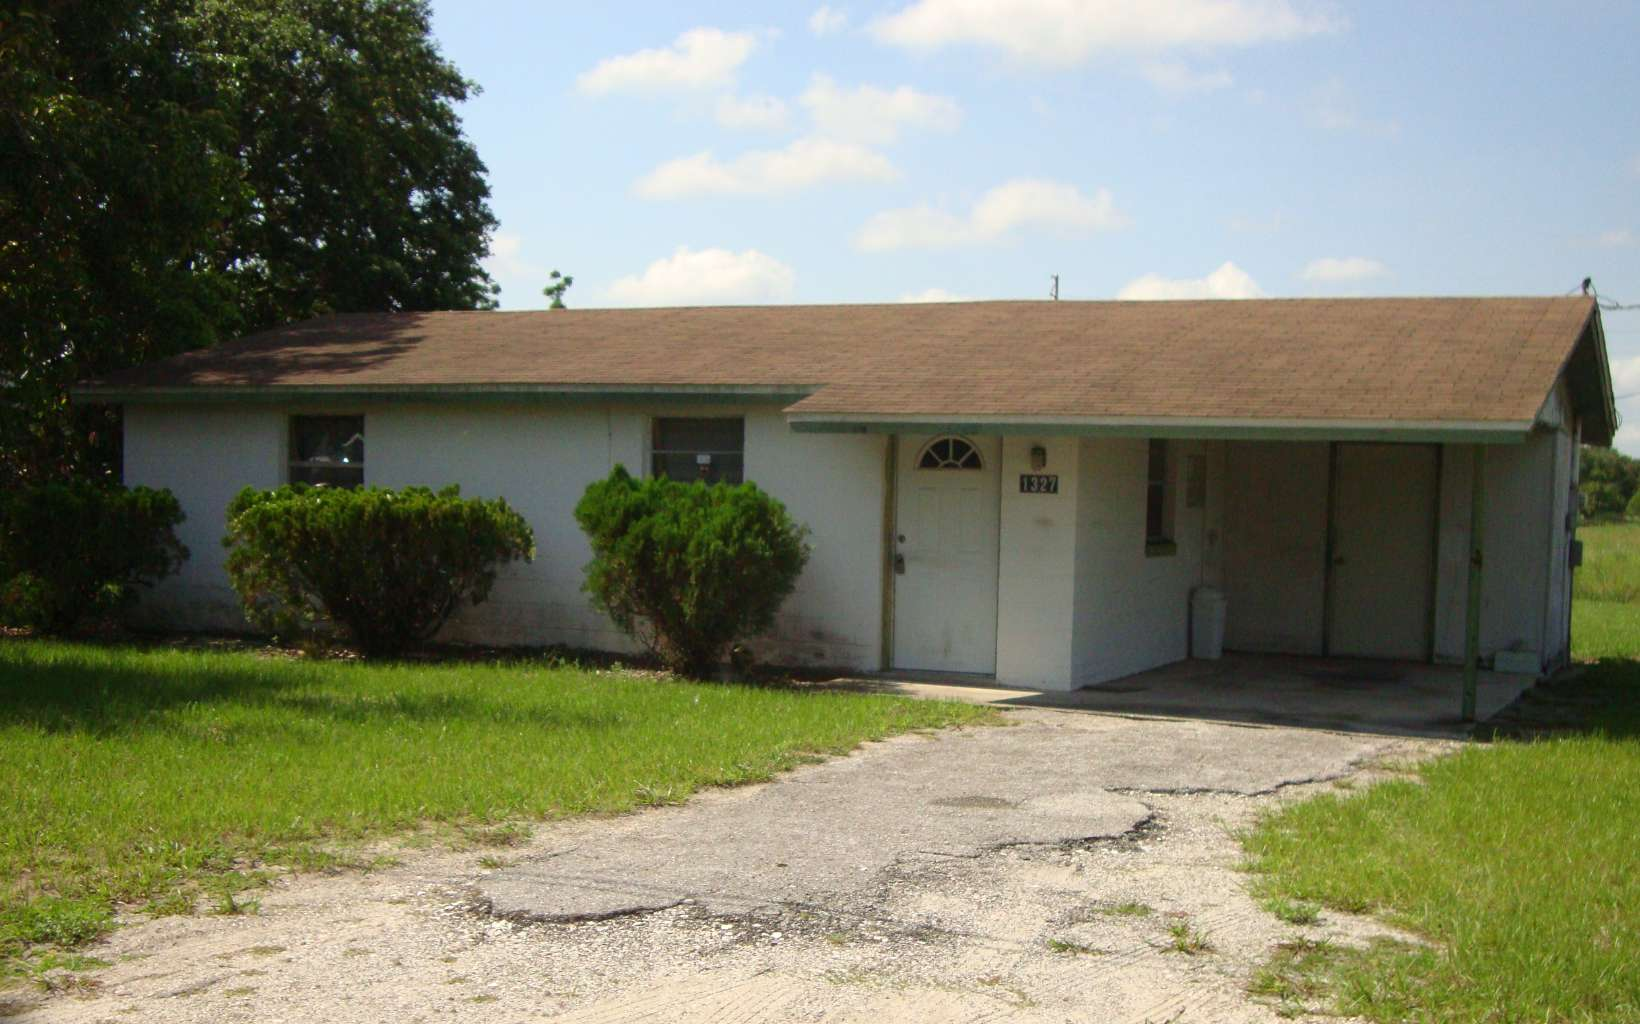 1327 Citrus Ave, Sebring, FL 33870